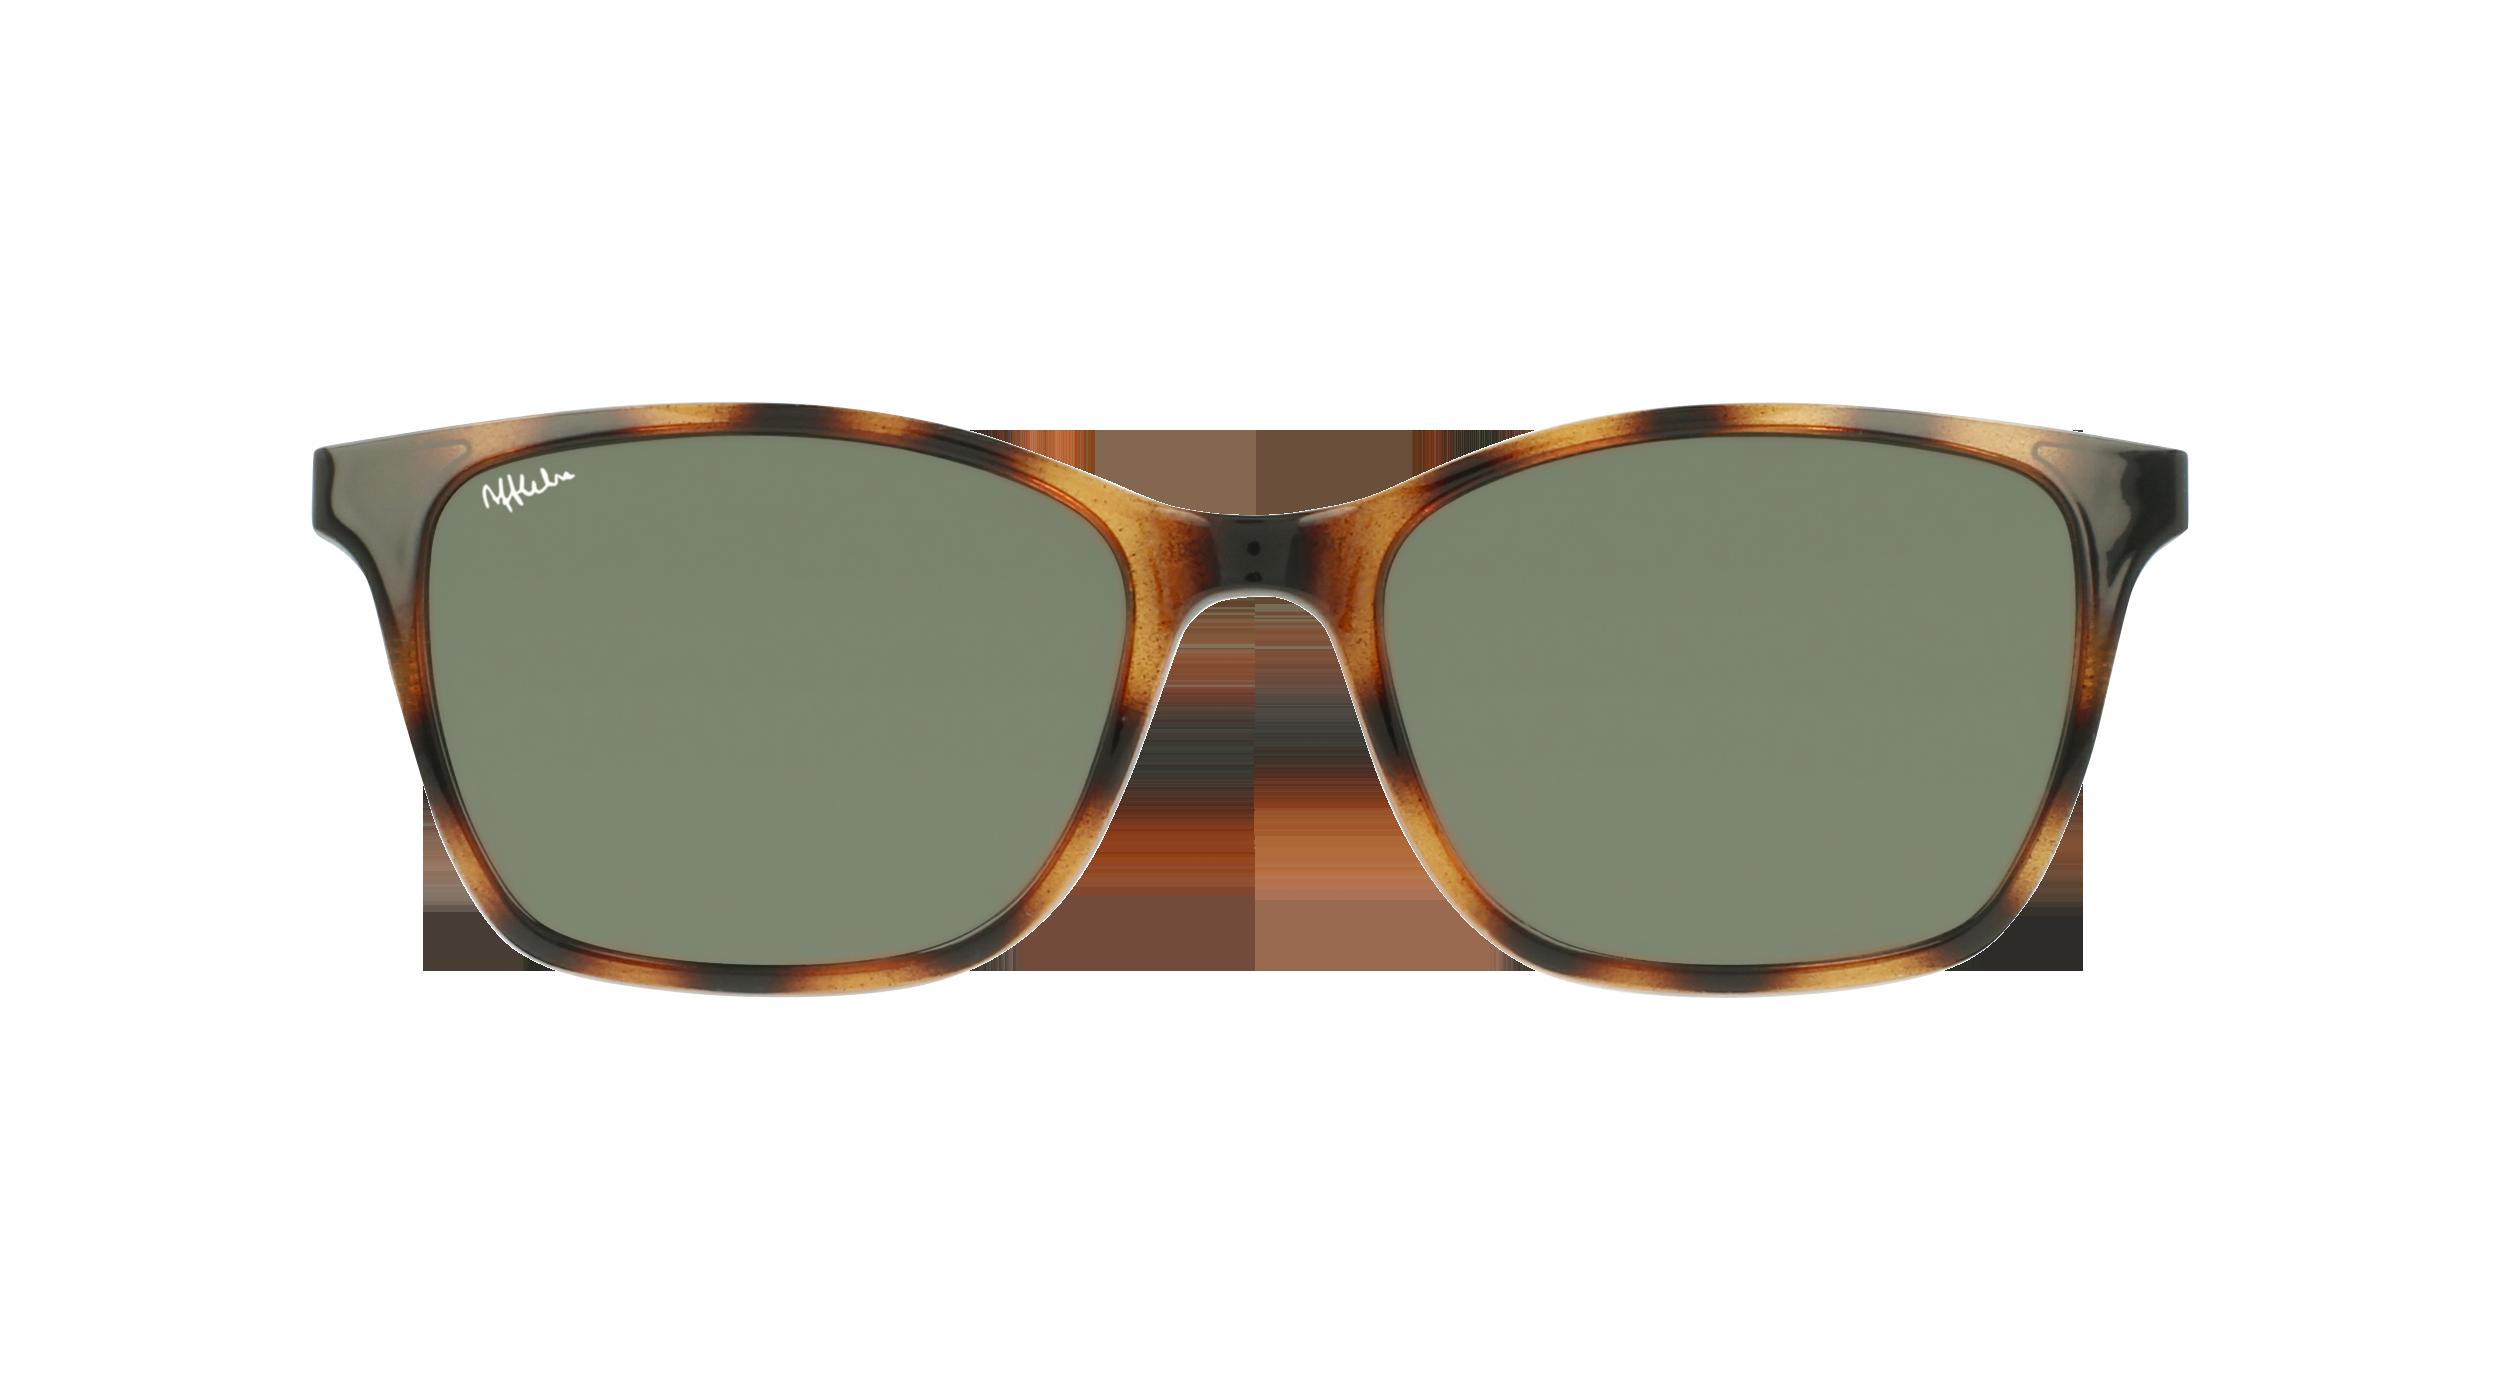 afflelou/france/products/smart_clip/clips_glasses/07630036457559.png